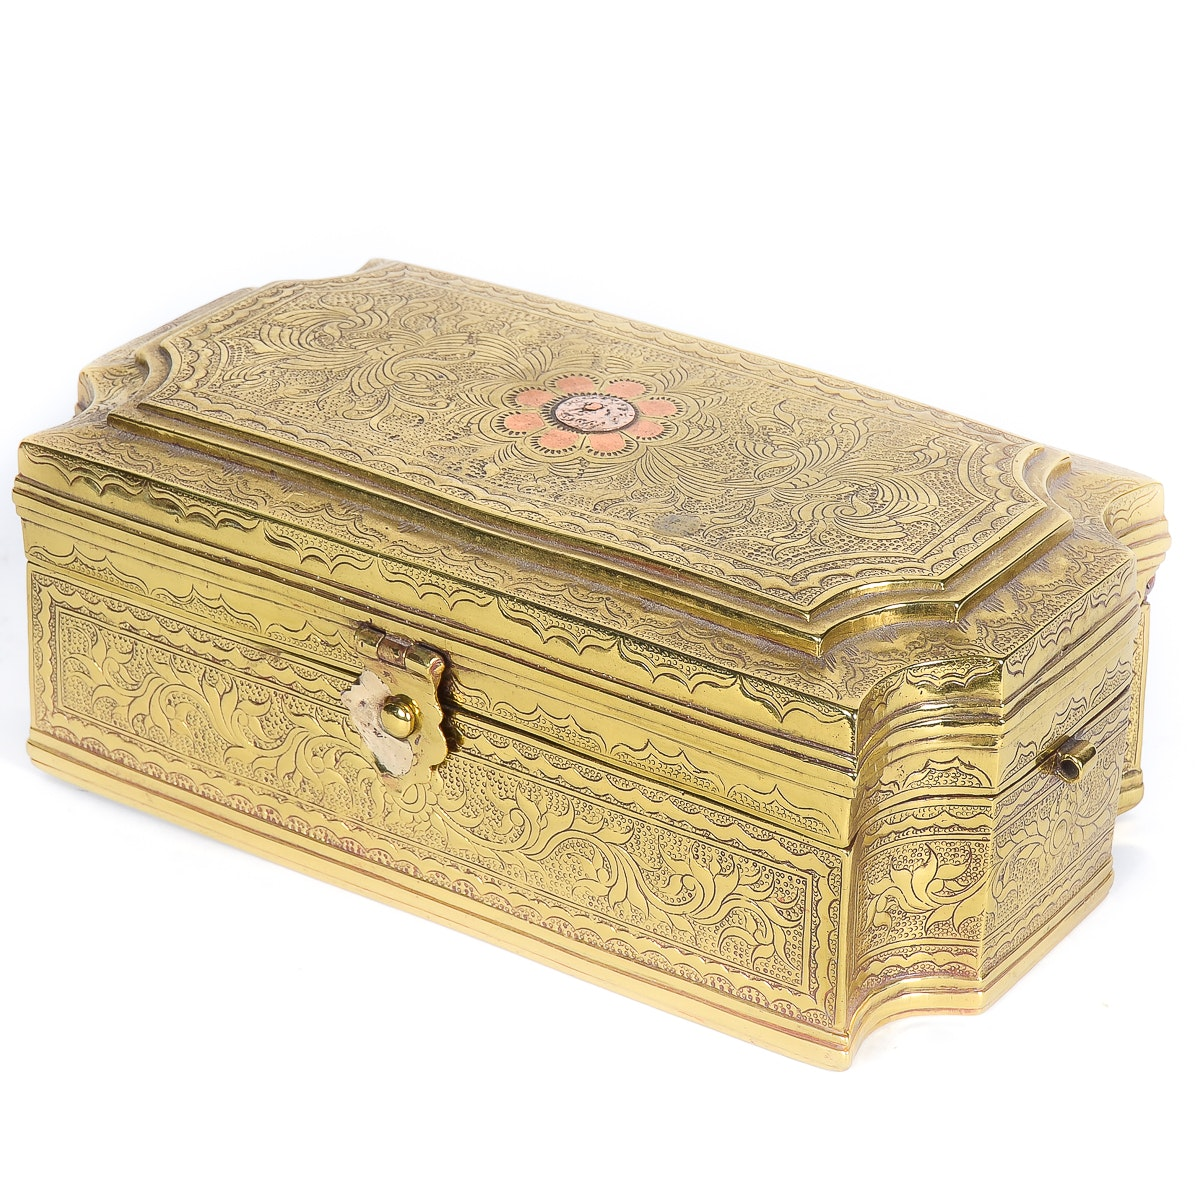 Antique Brass and Cooper Trinket Box